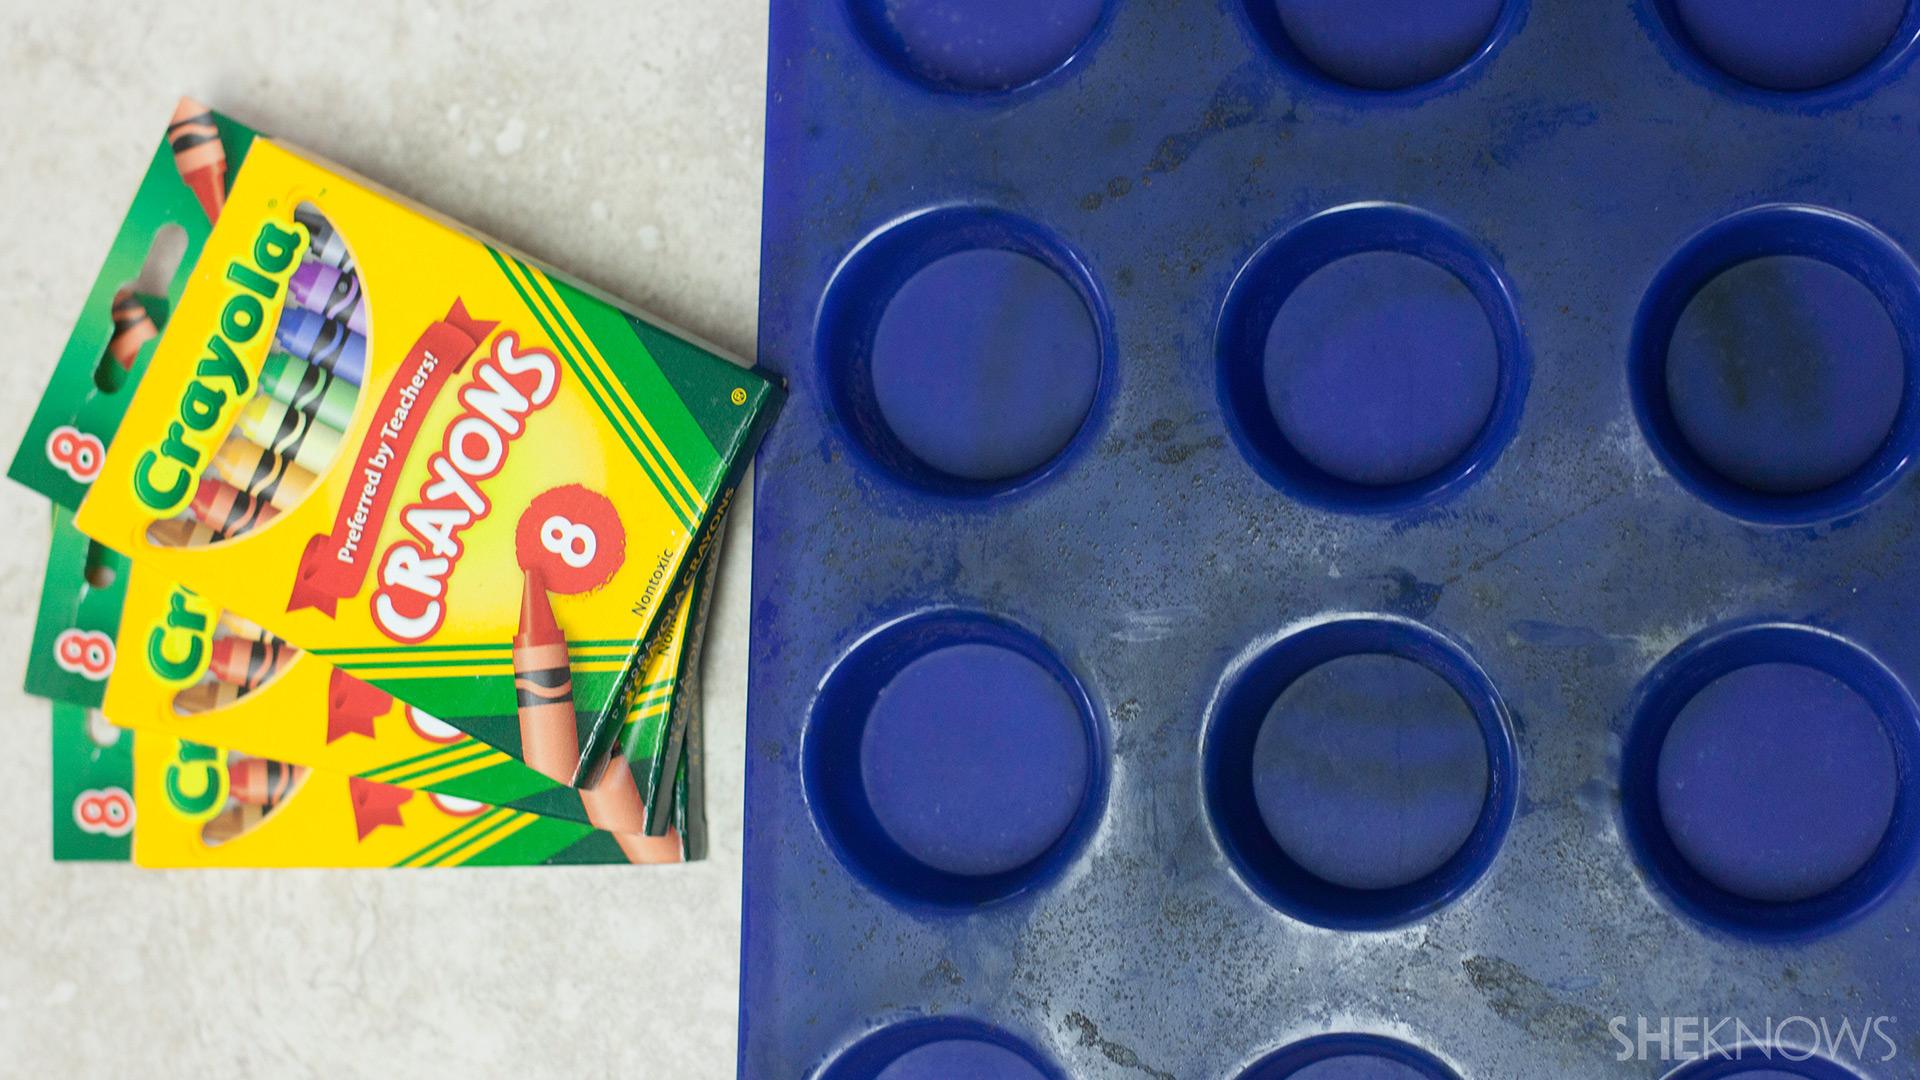 Toddler crayon | Sheknows.com - Supplies